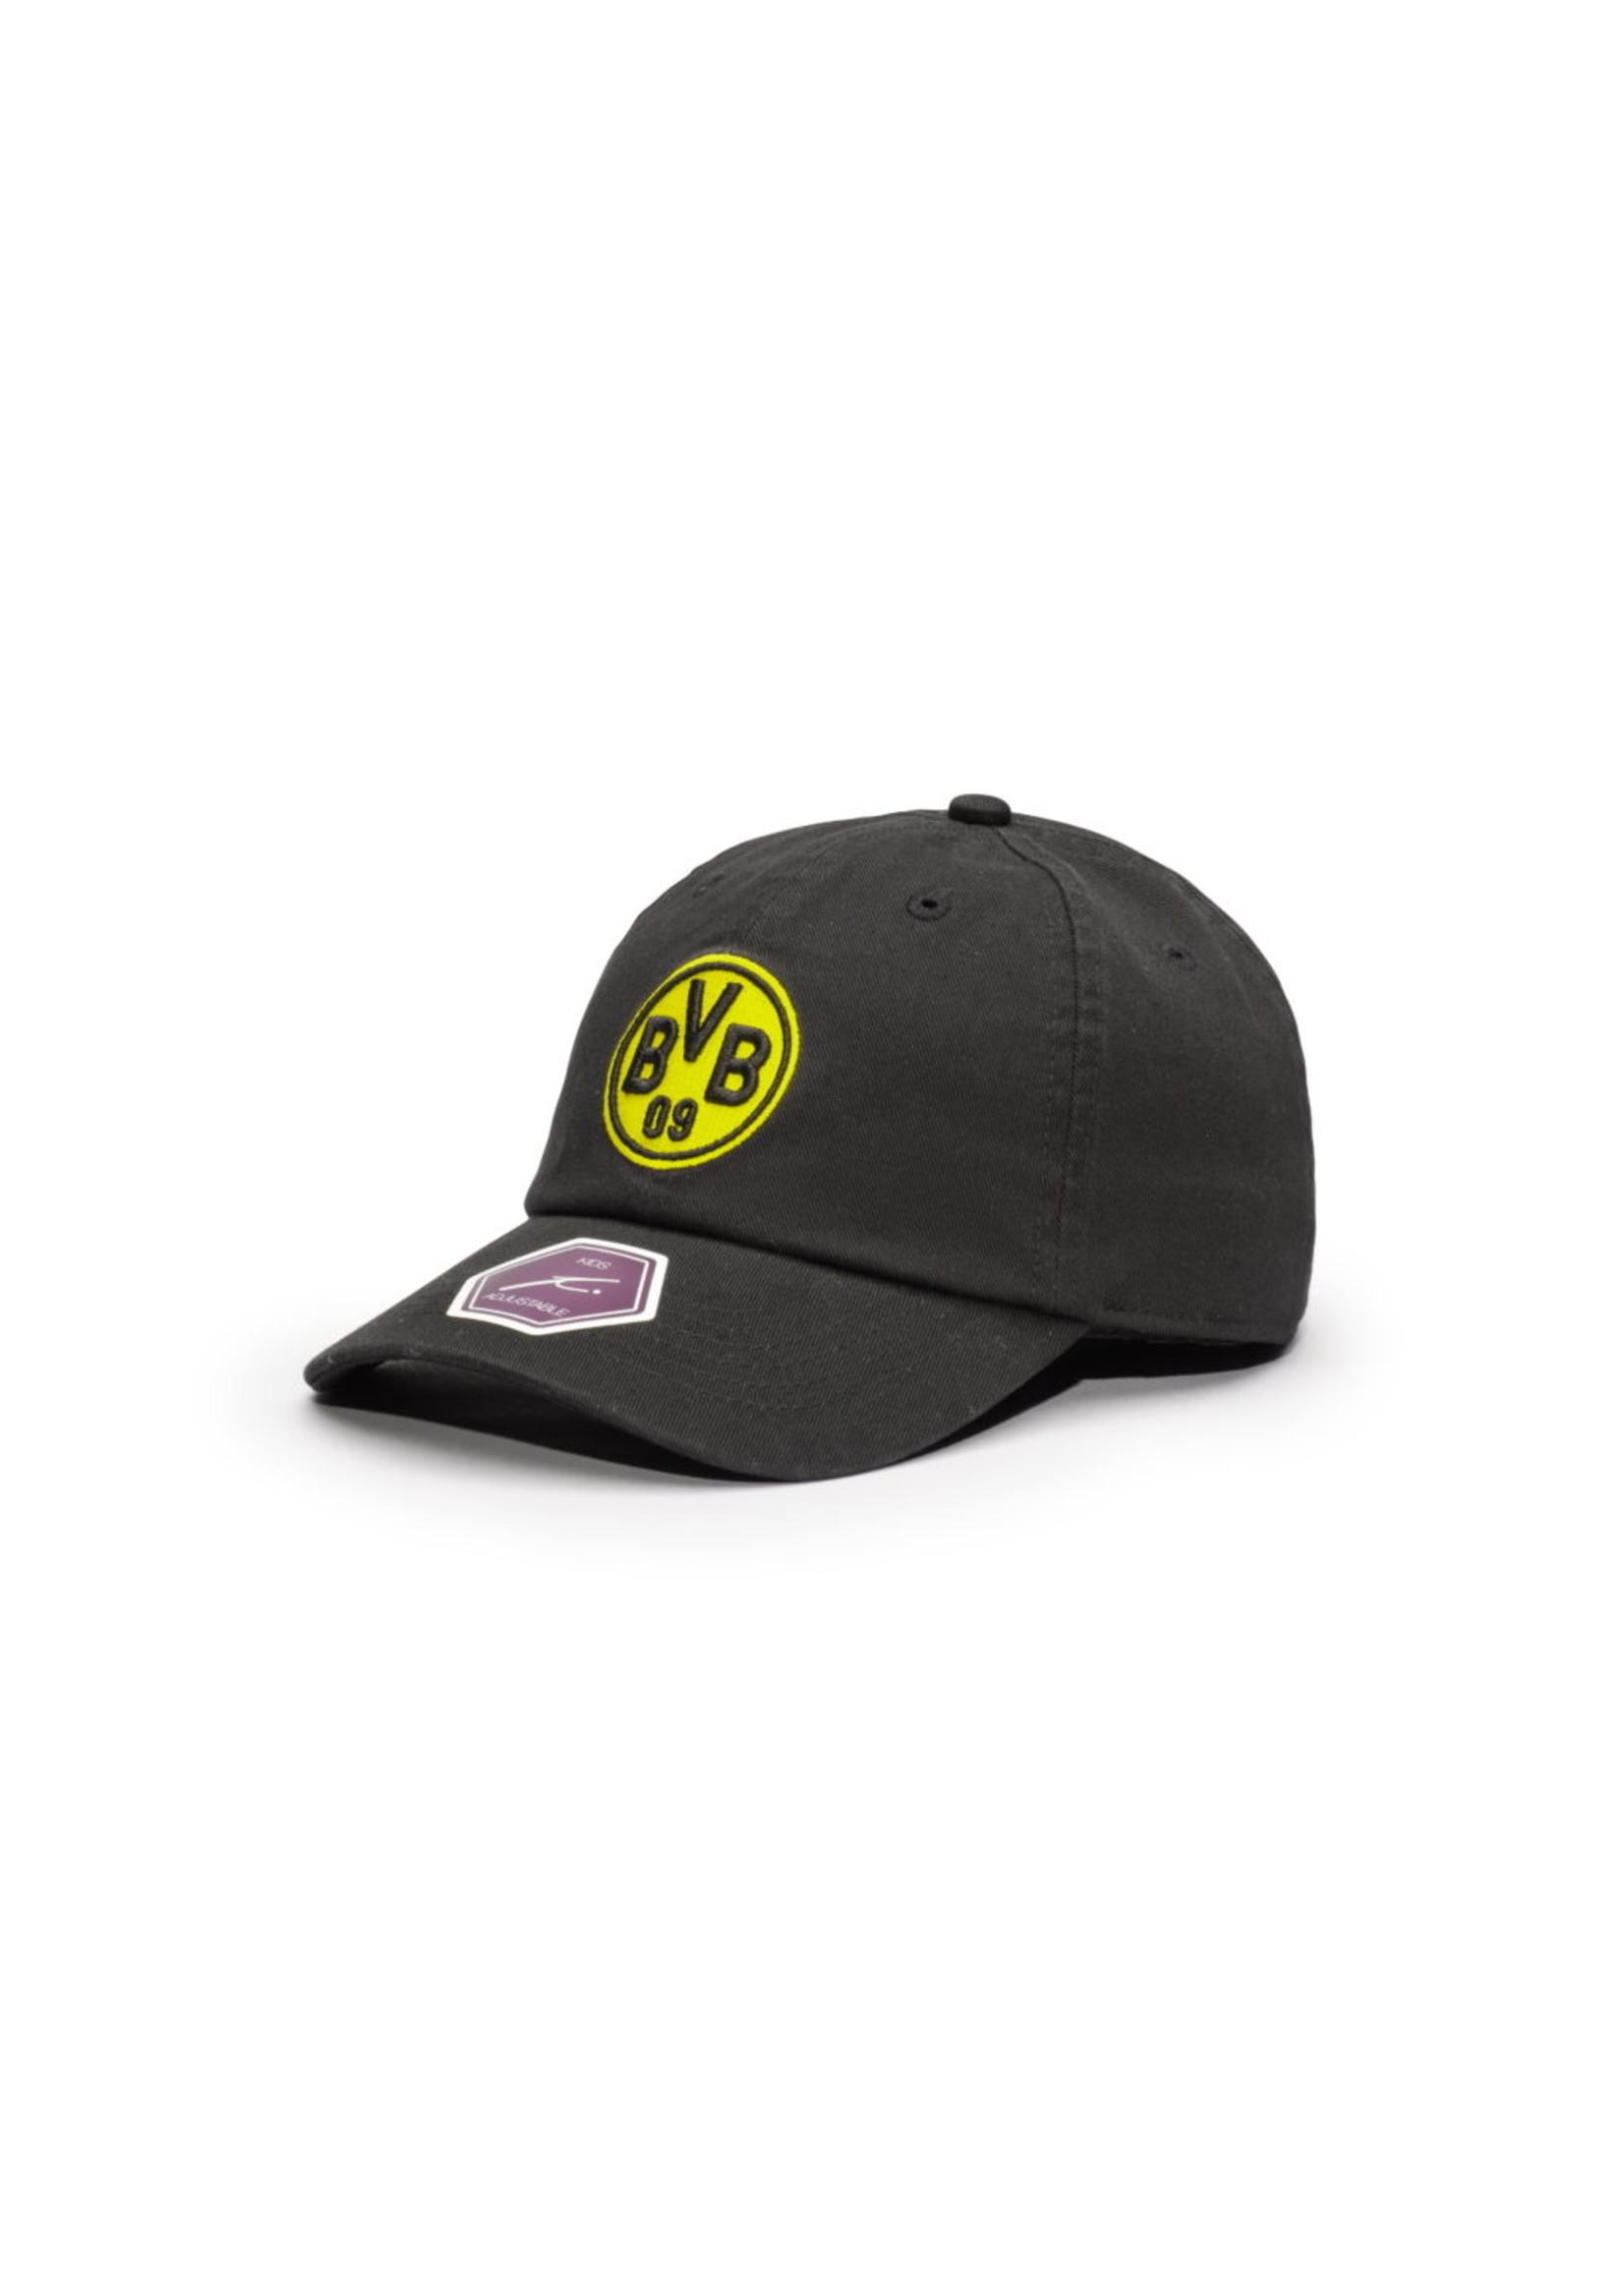 Borussia Dortmund Youth Classic Hat